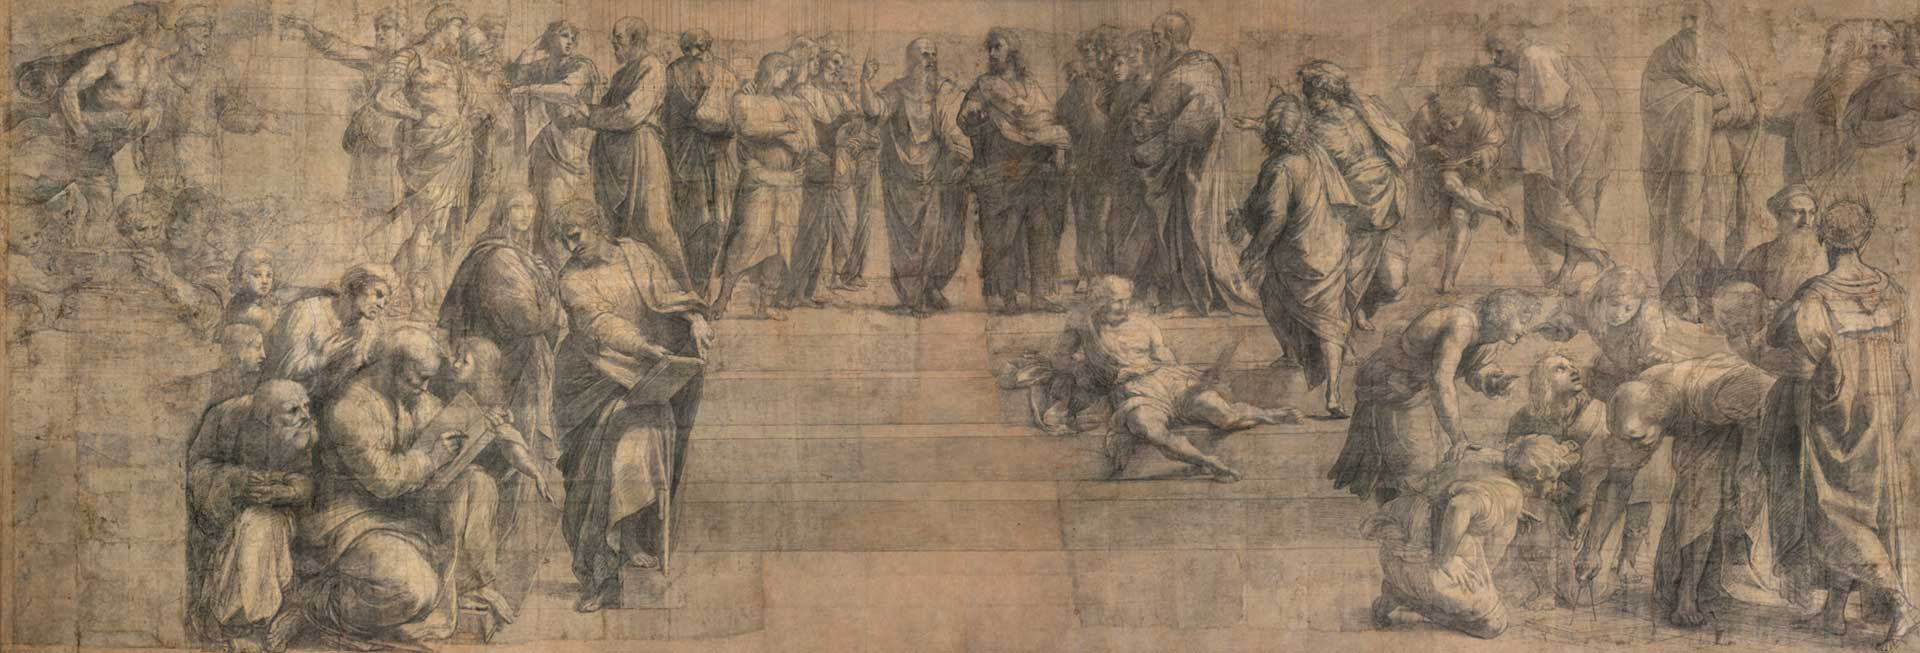 Philosophy-Raffaello-Sanzio-at-Pinacoteca-Ambrosiana